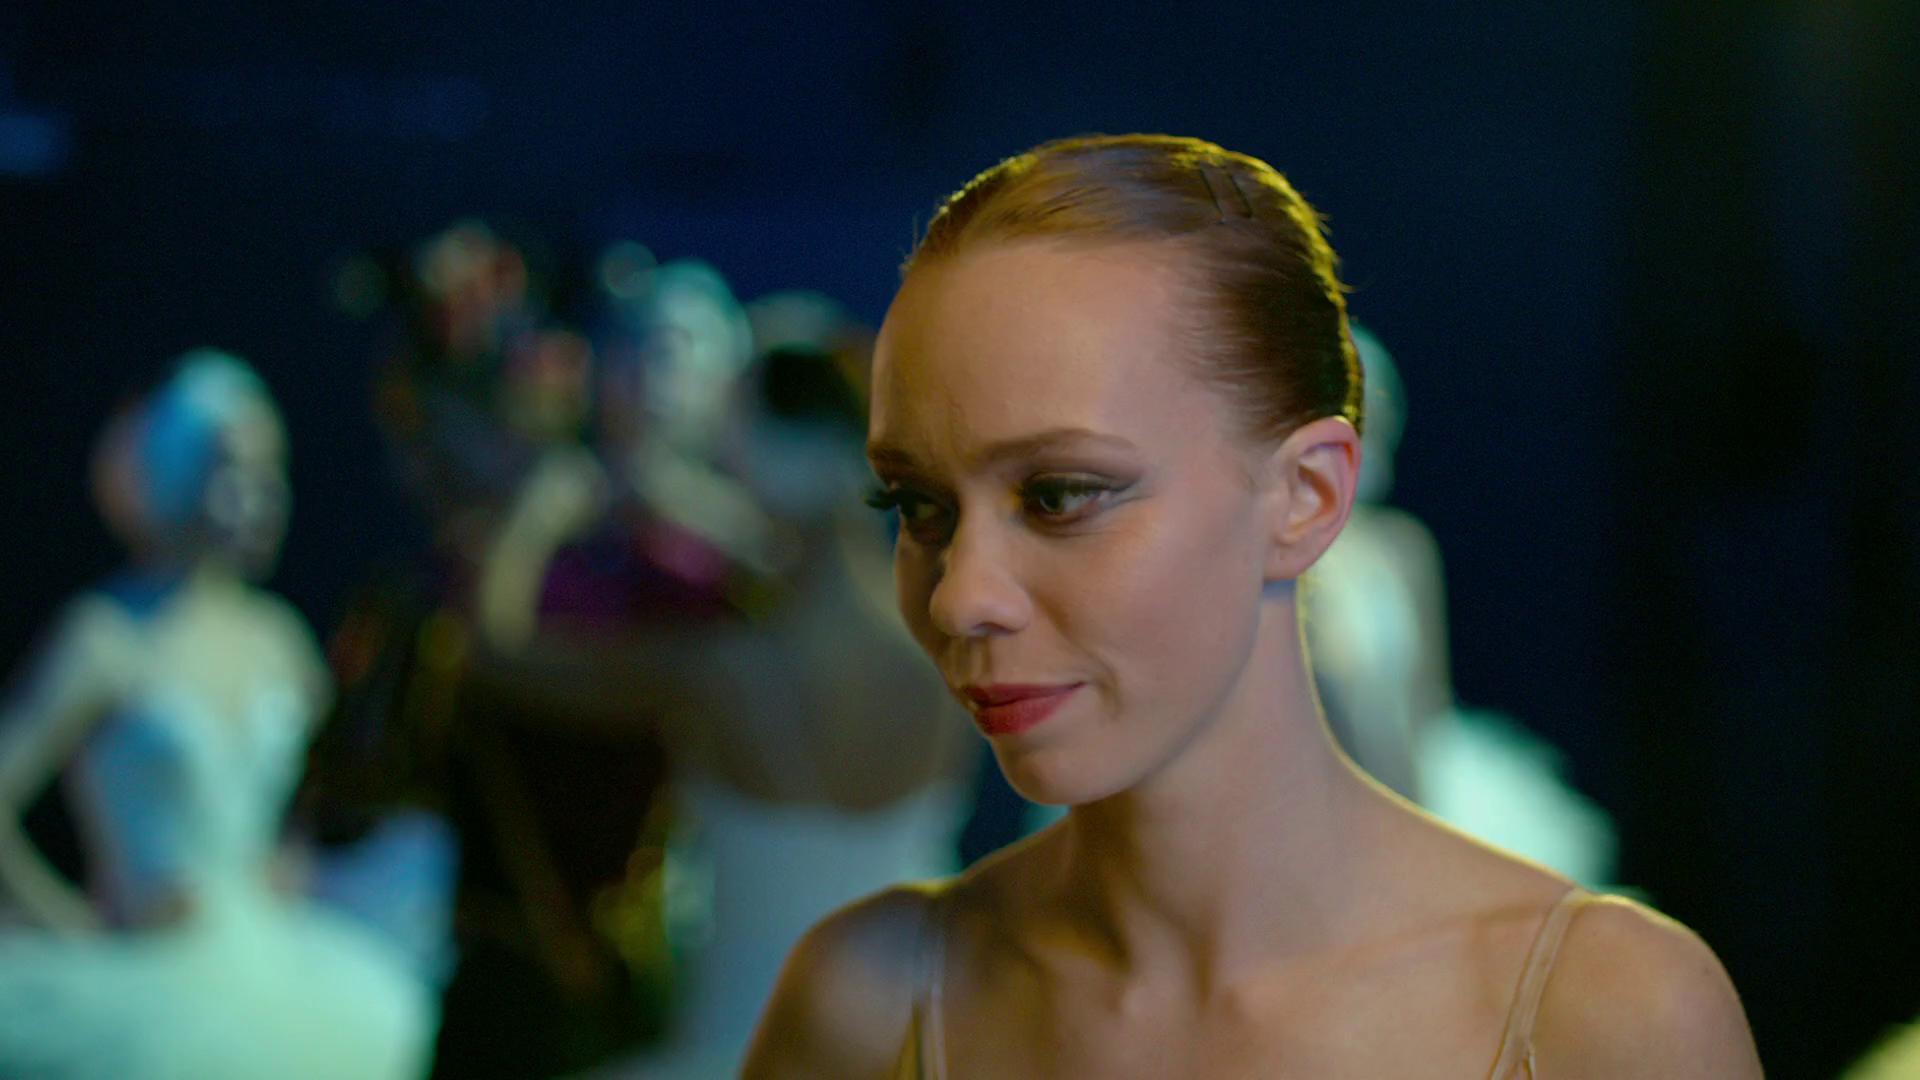 devushka-tantsuet-moyas-pod-dushem-porno-filmi